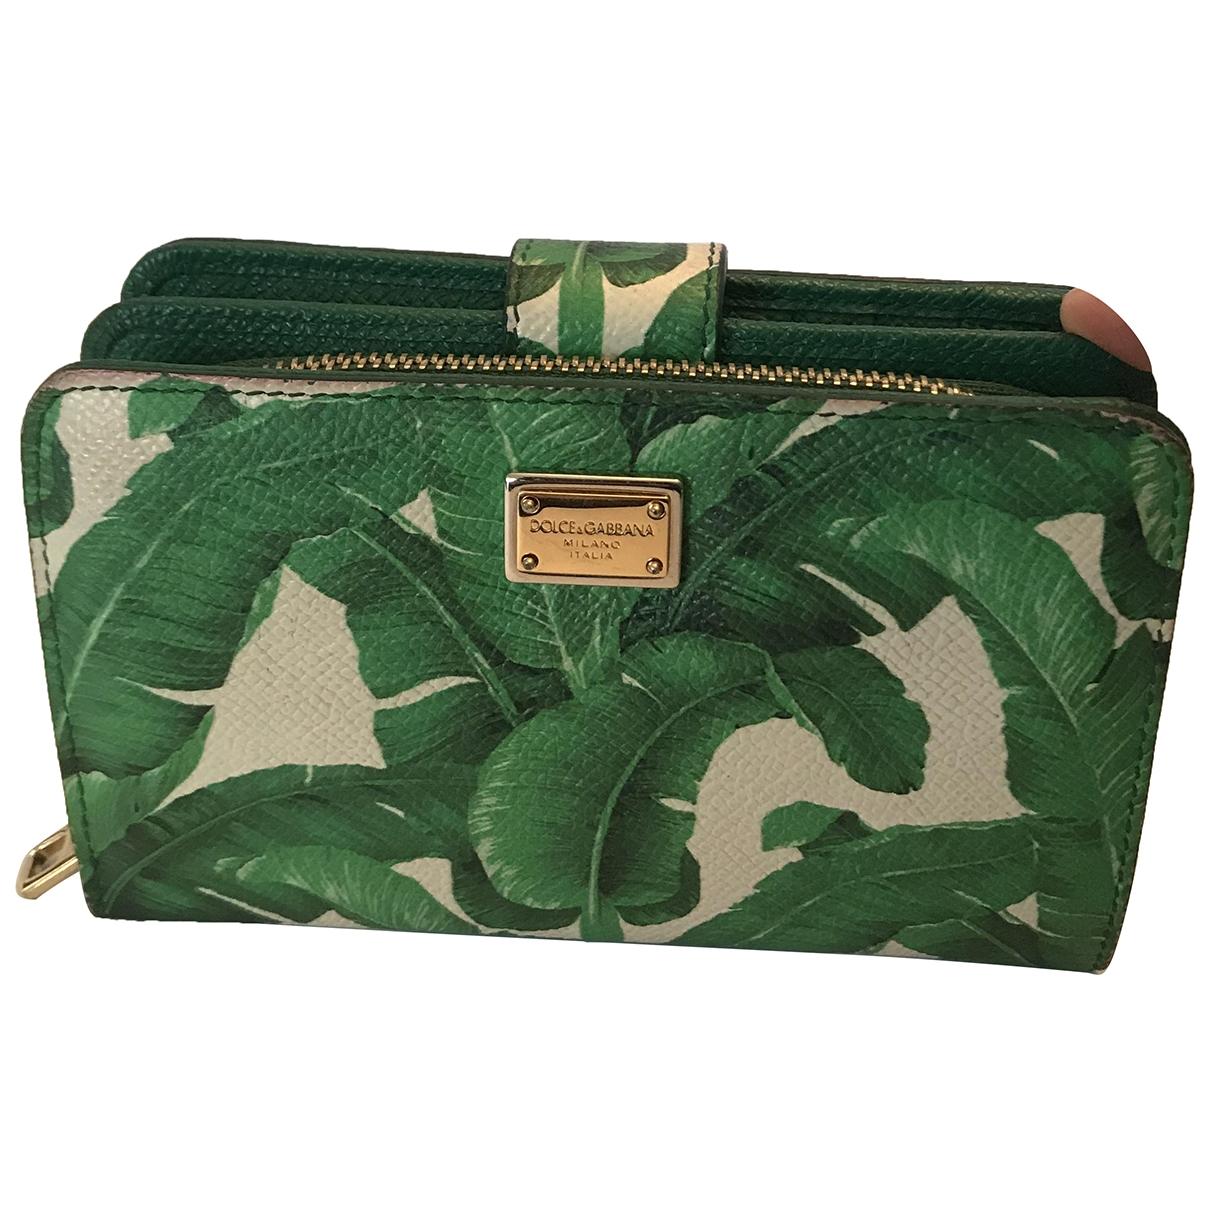 Dolce & Gabbana - Portefeuille   pour femme en cuir - vert